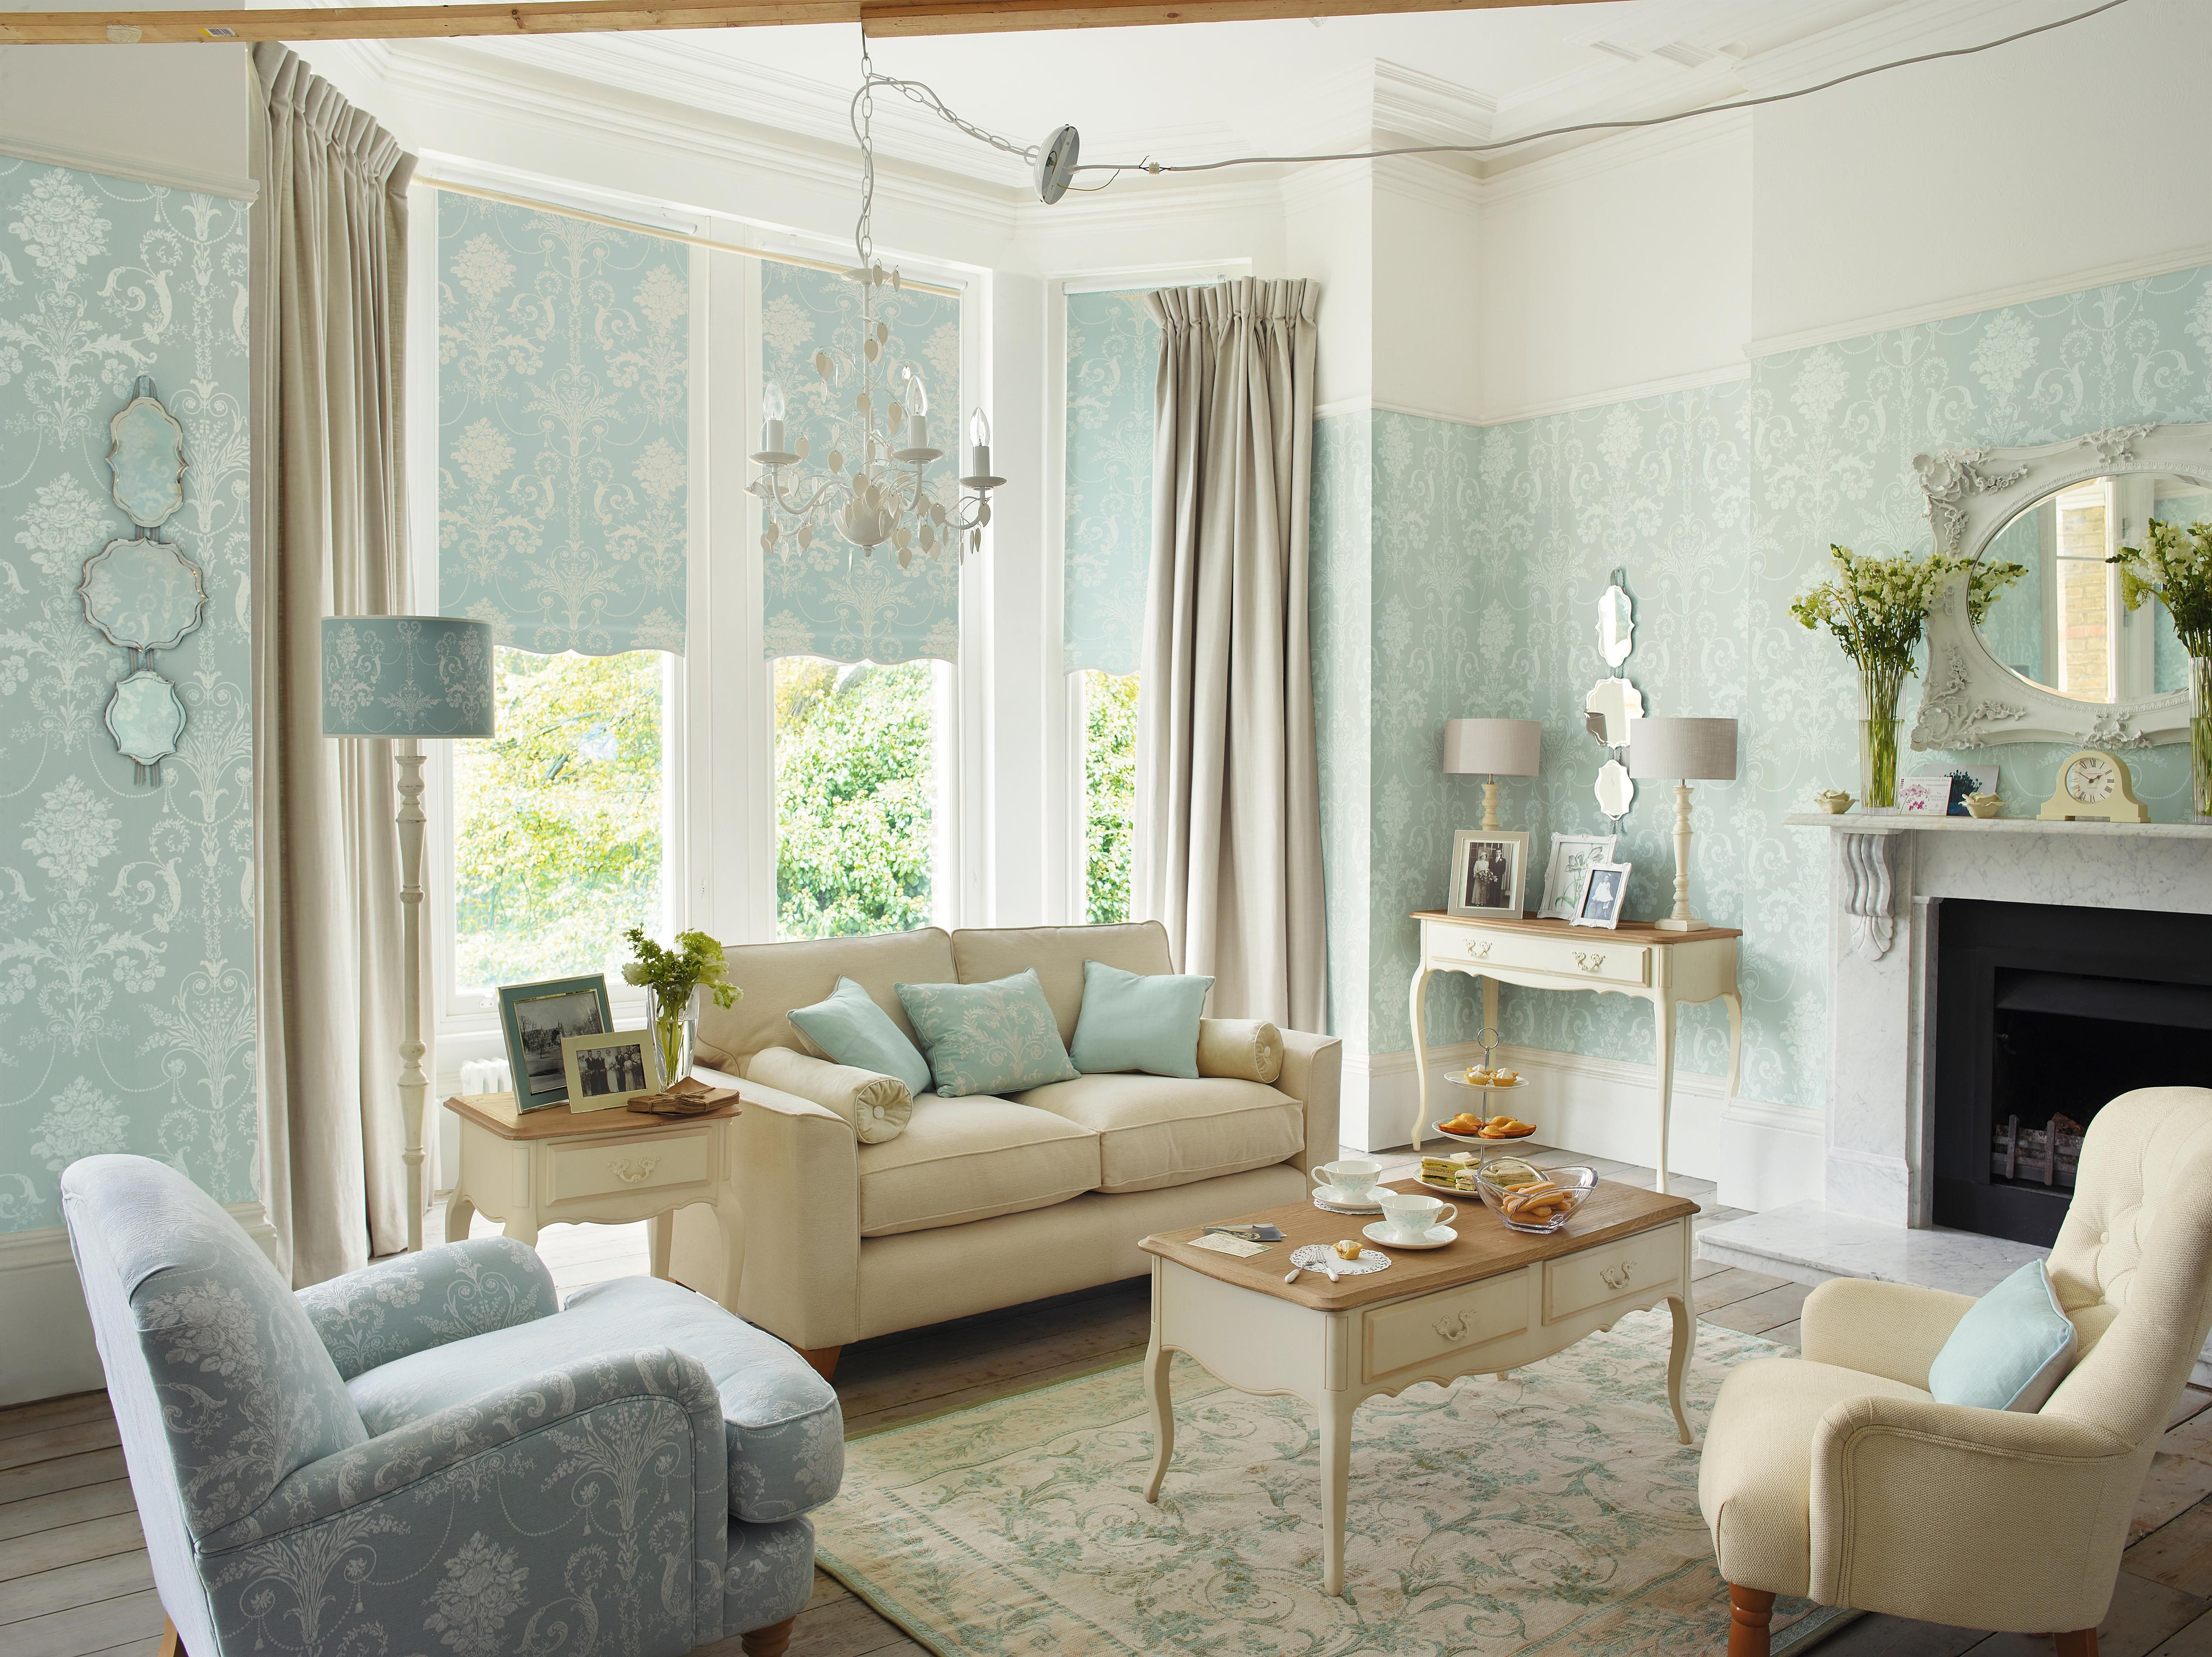 Deco Style Cottage Anglais Avec Images Style Cottage Anglais